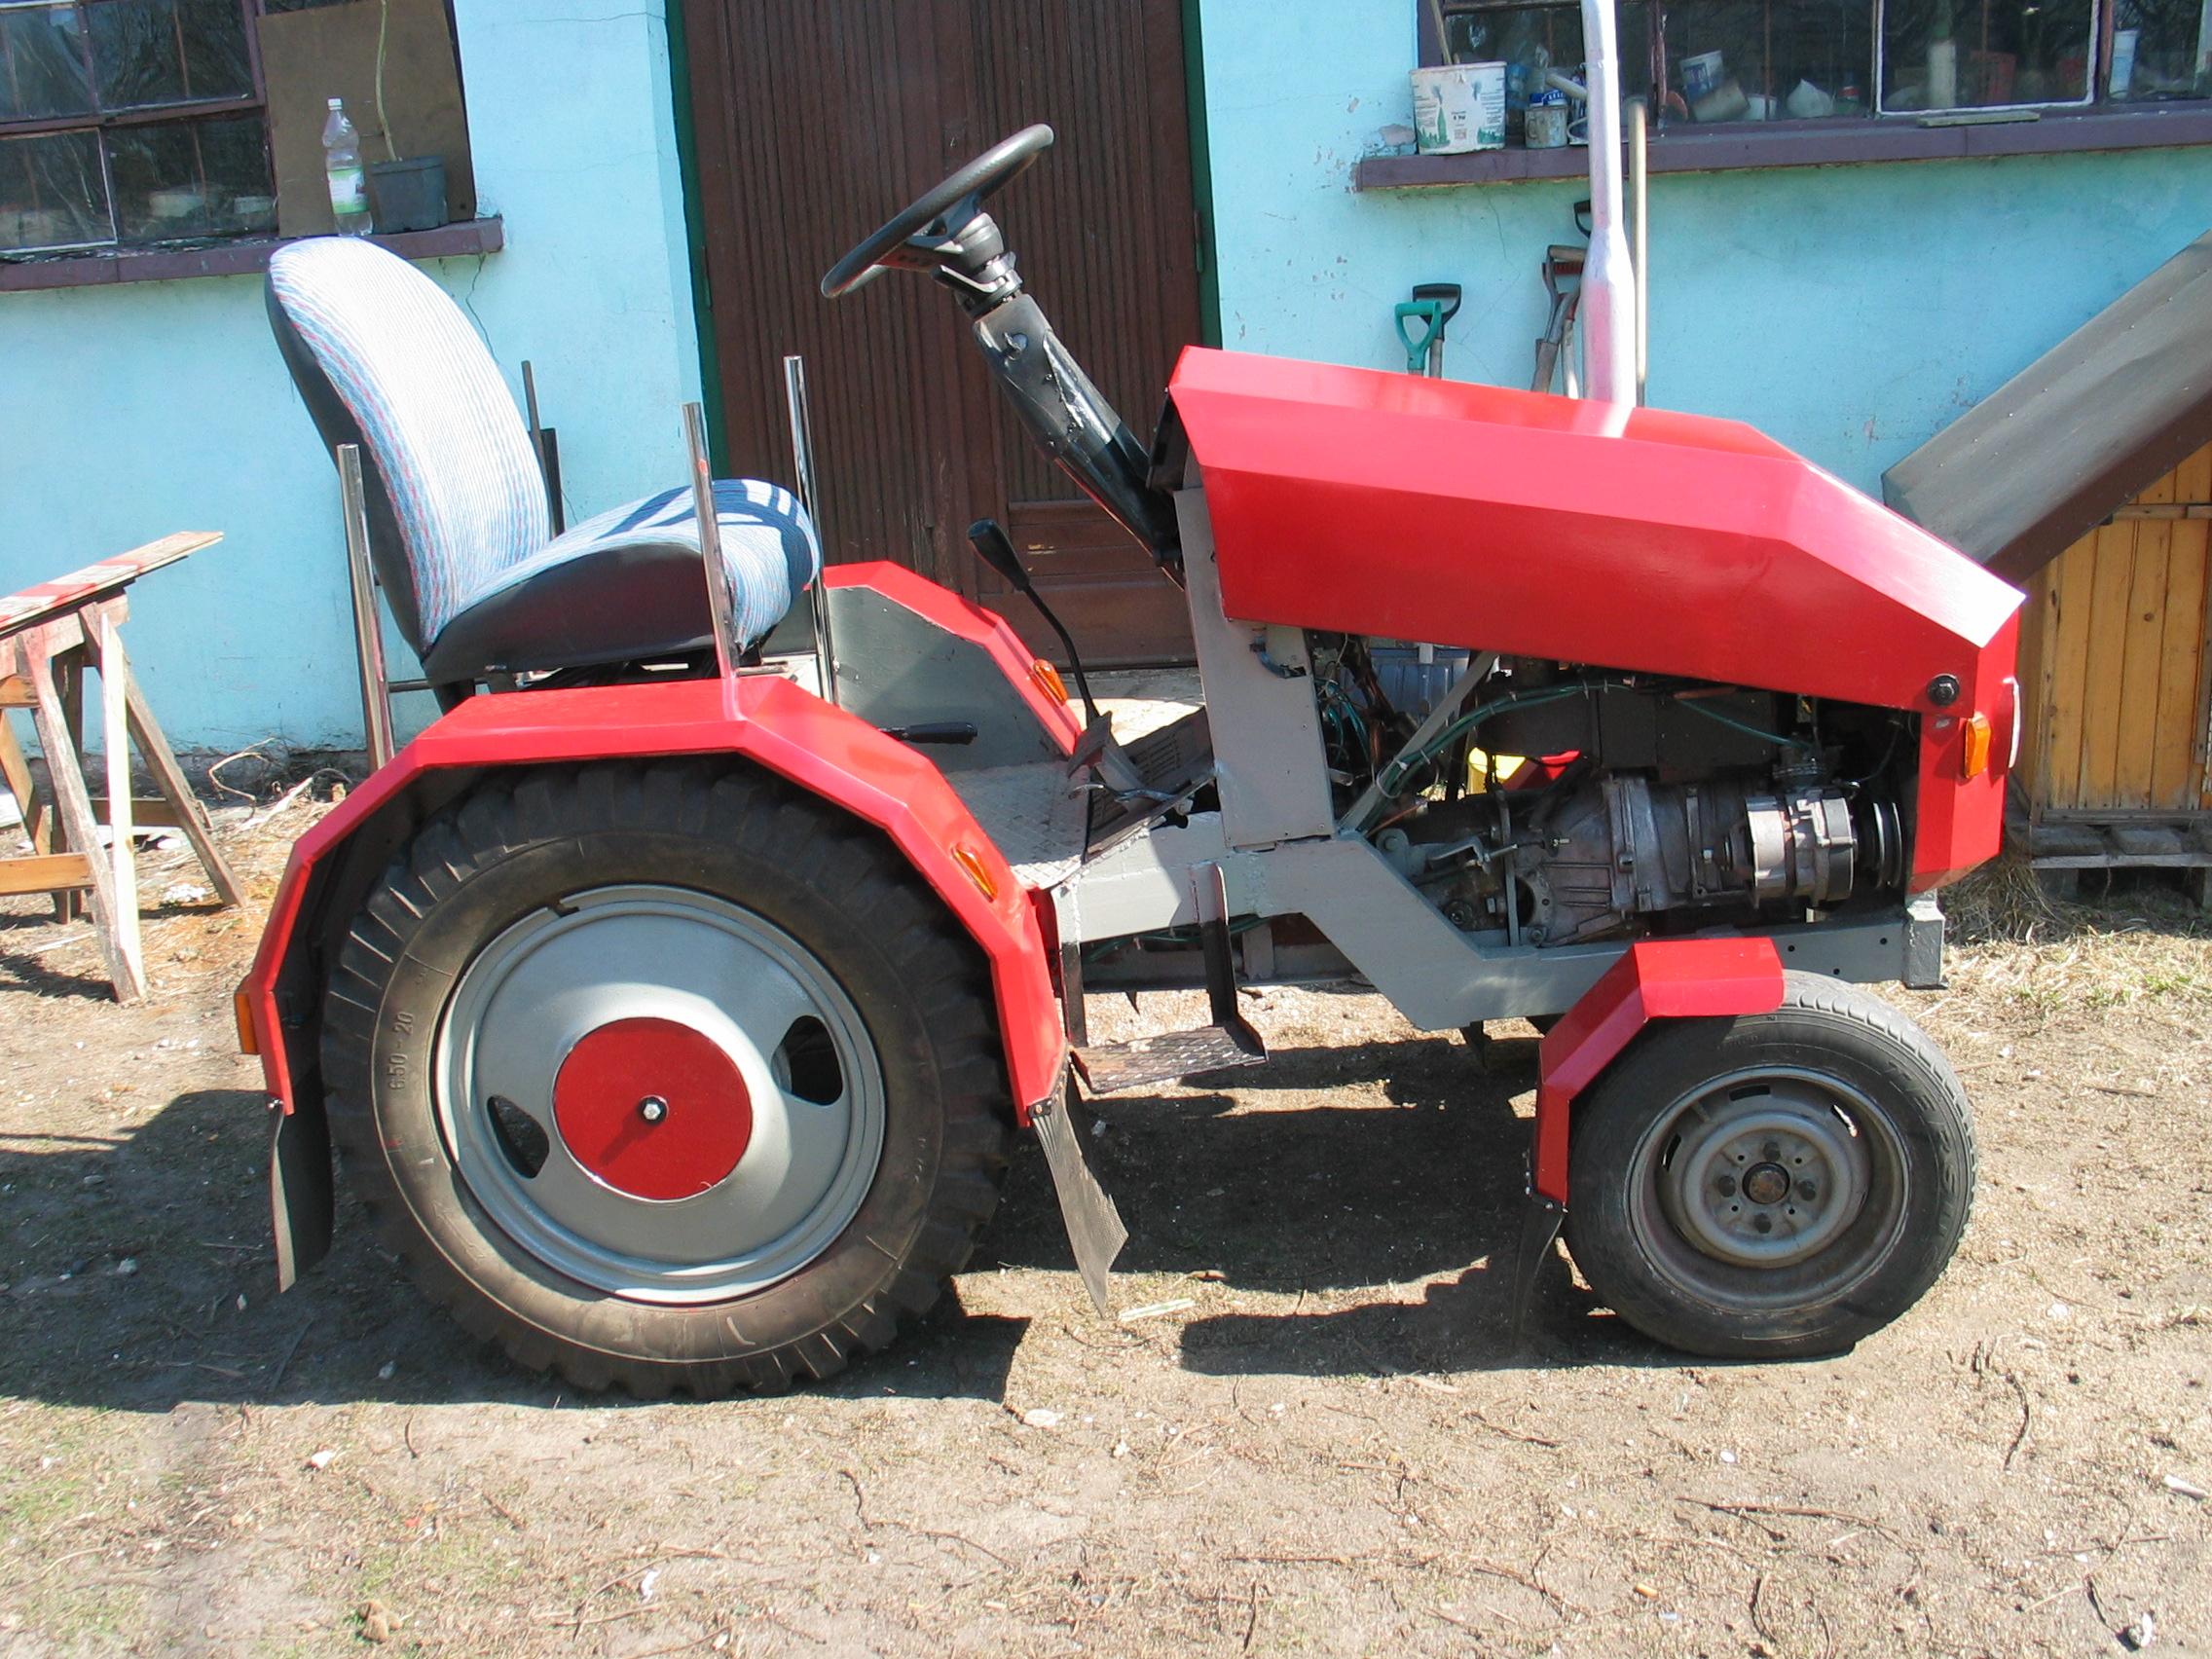 Moj maly traktorek SAM z Fiata126p